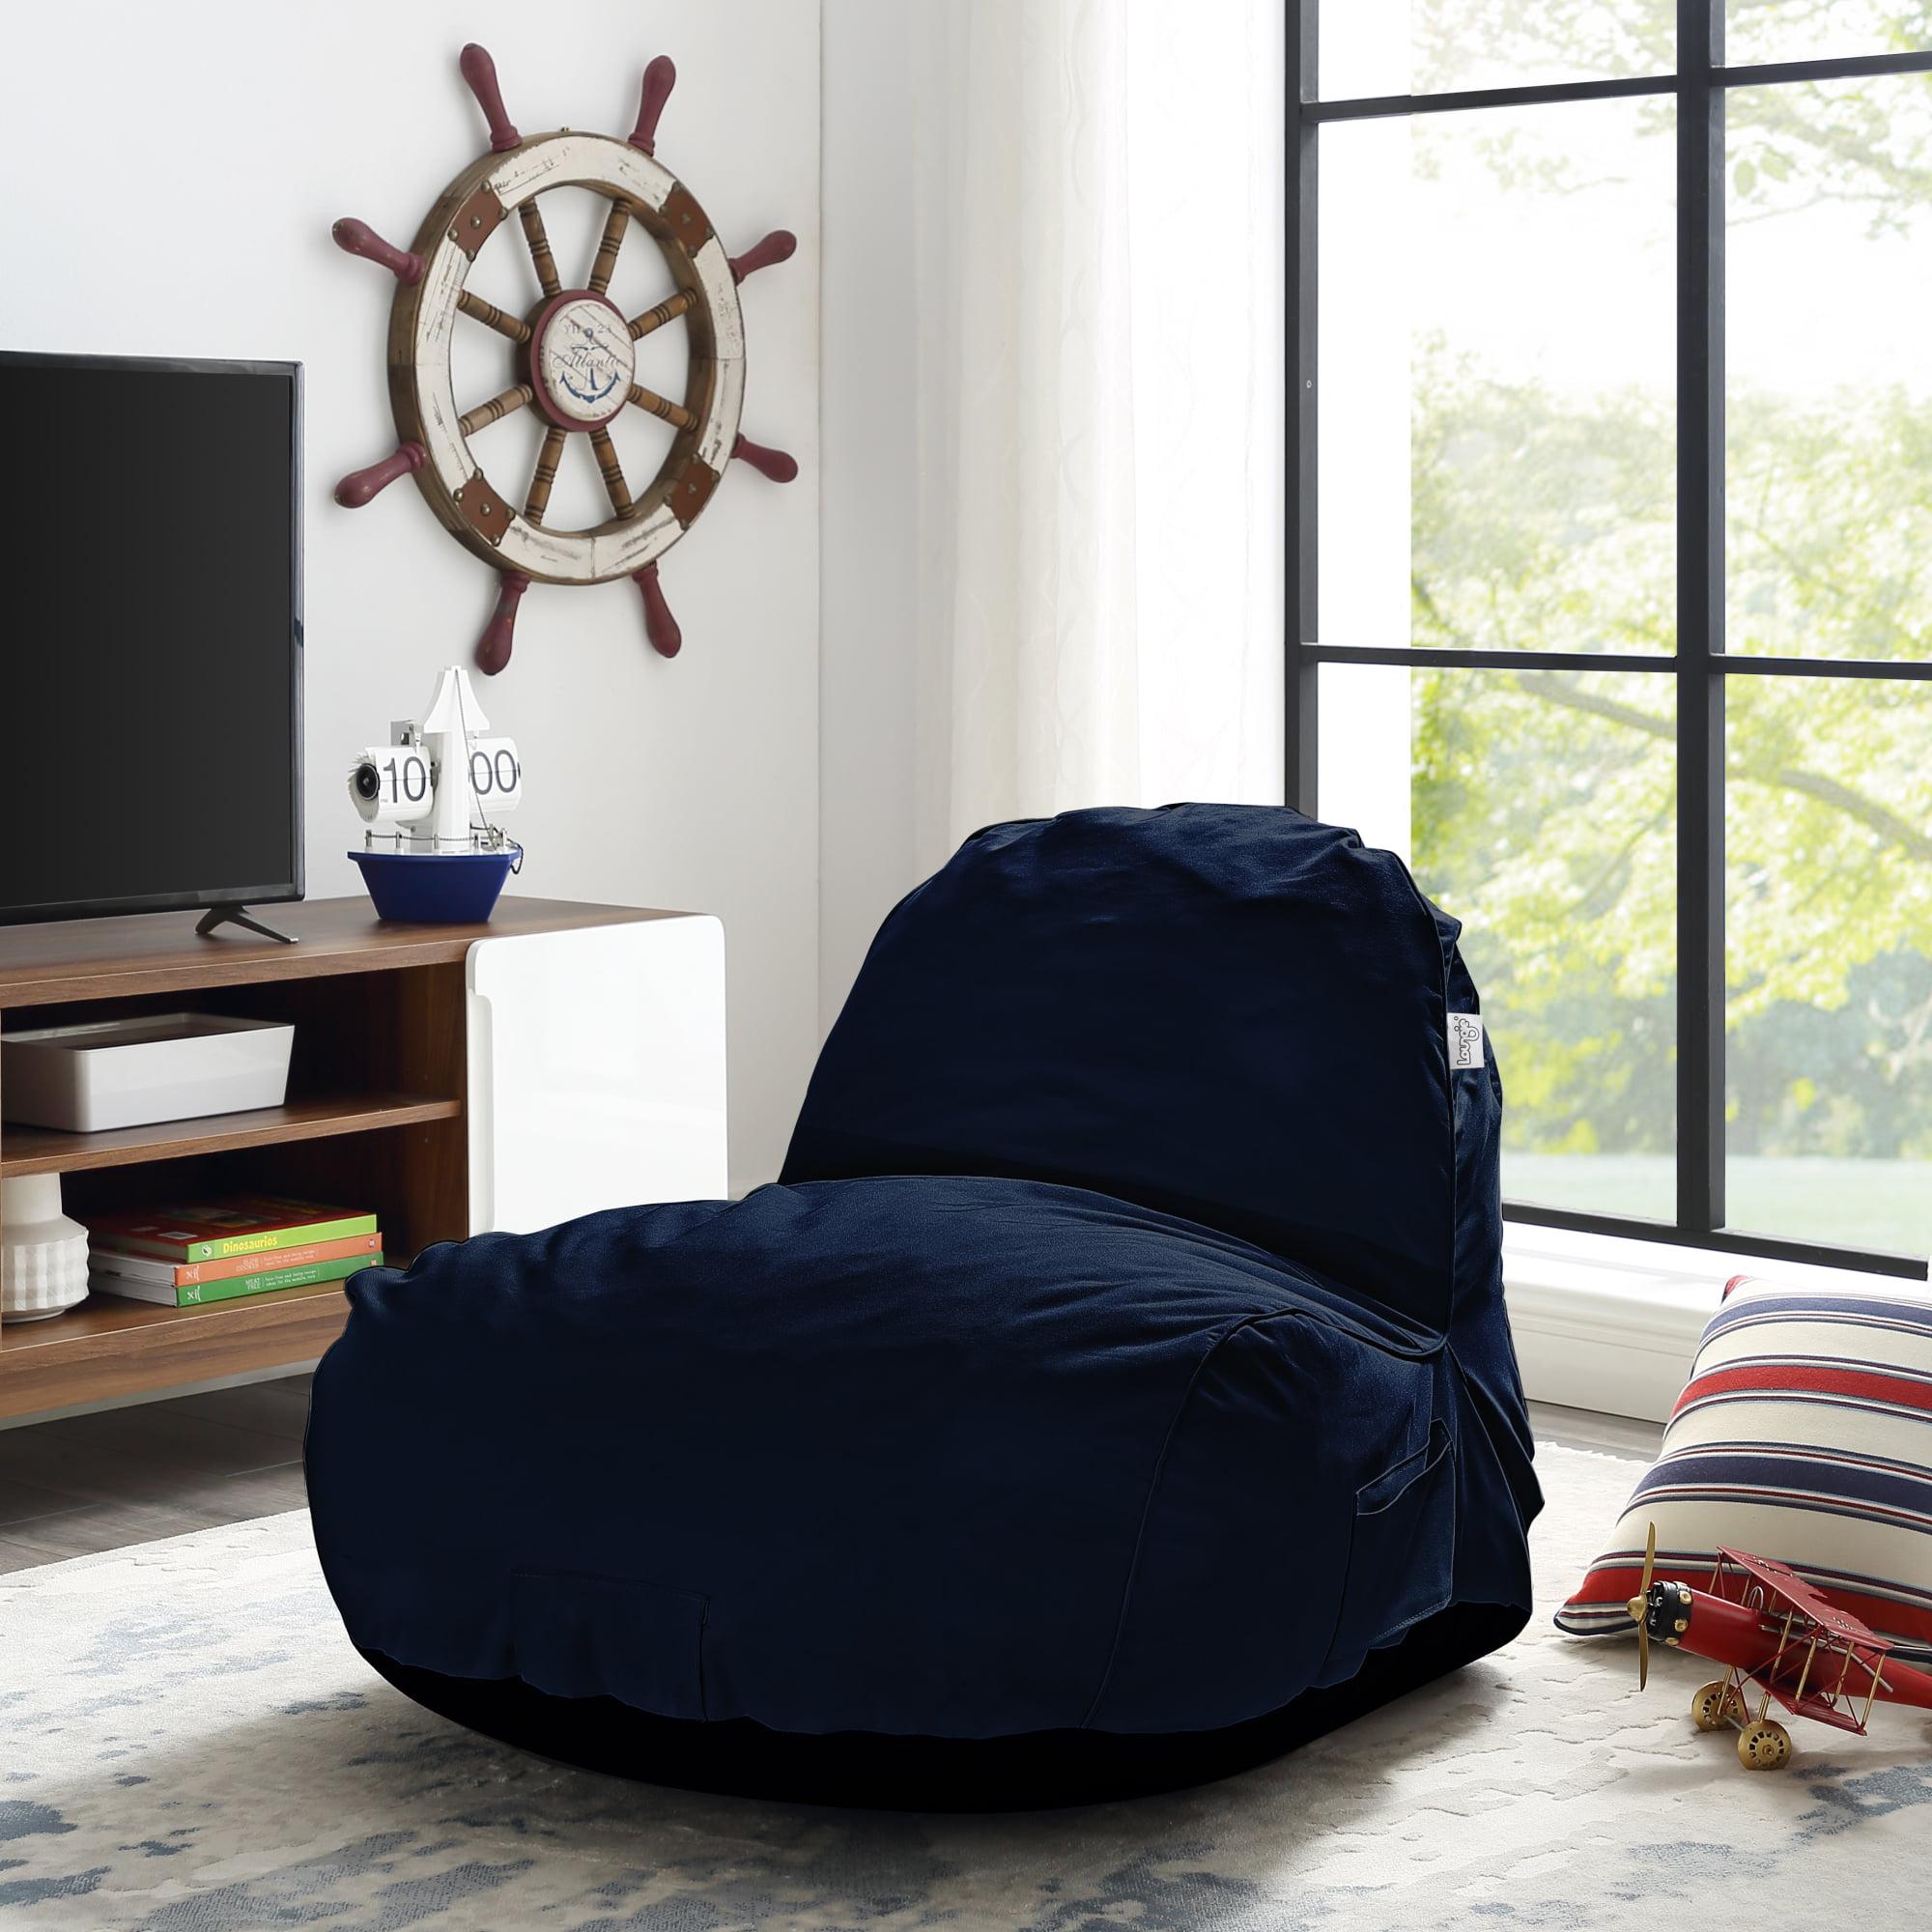 Cosmic Grey Foam Lounge Chair - Nylon   Indoor/ Outdoor   Self Expanding   Water Resistant   Bean Bag Chair